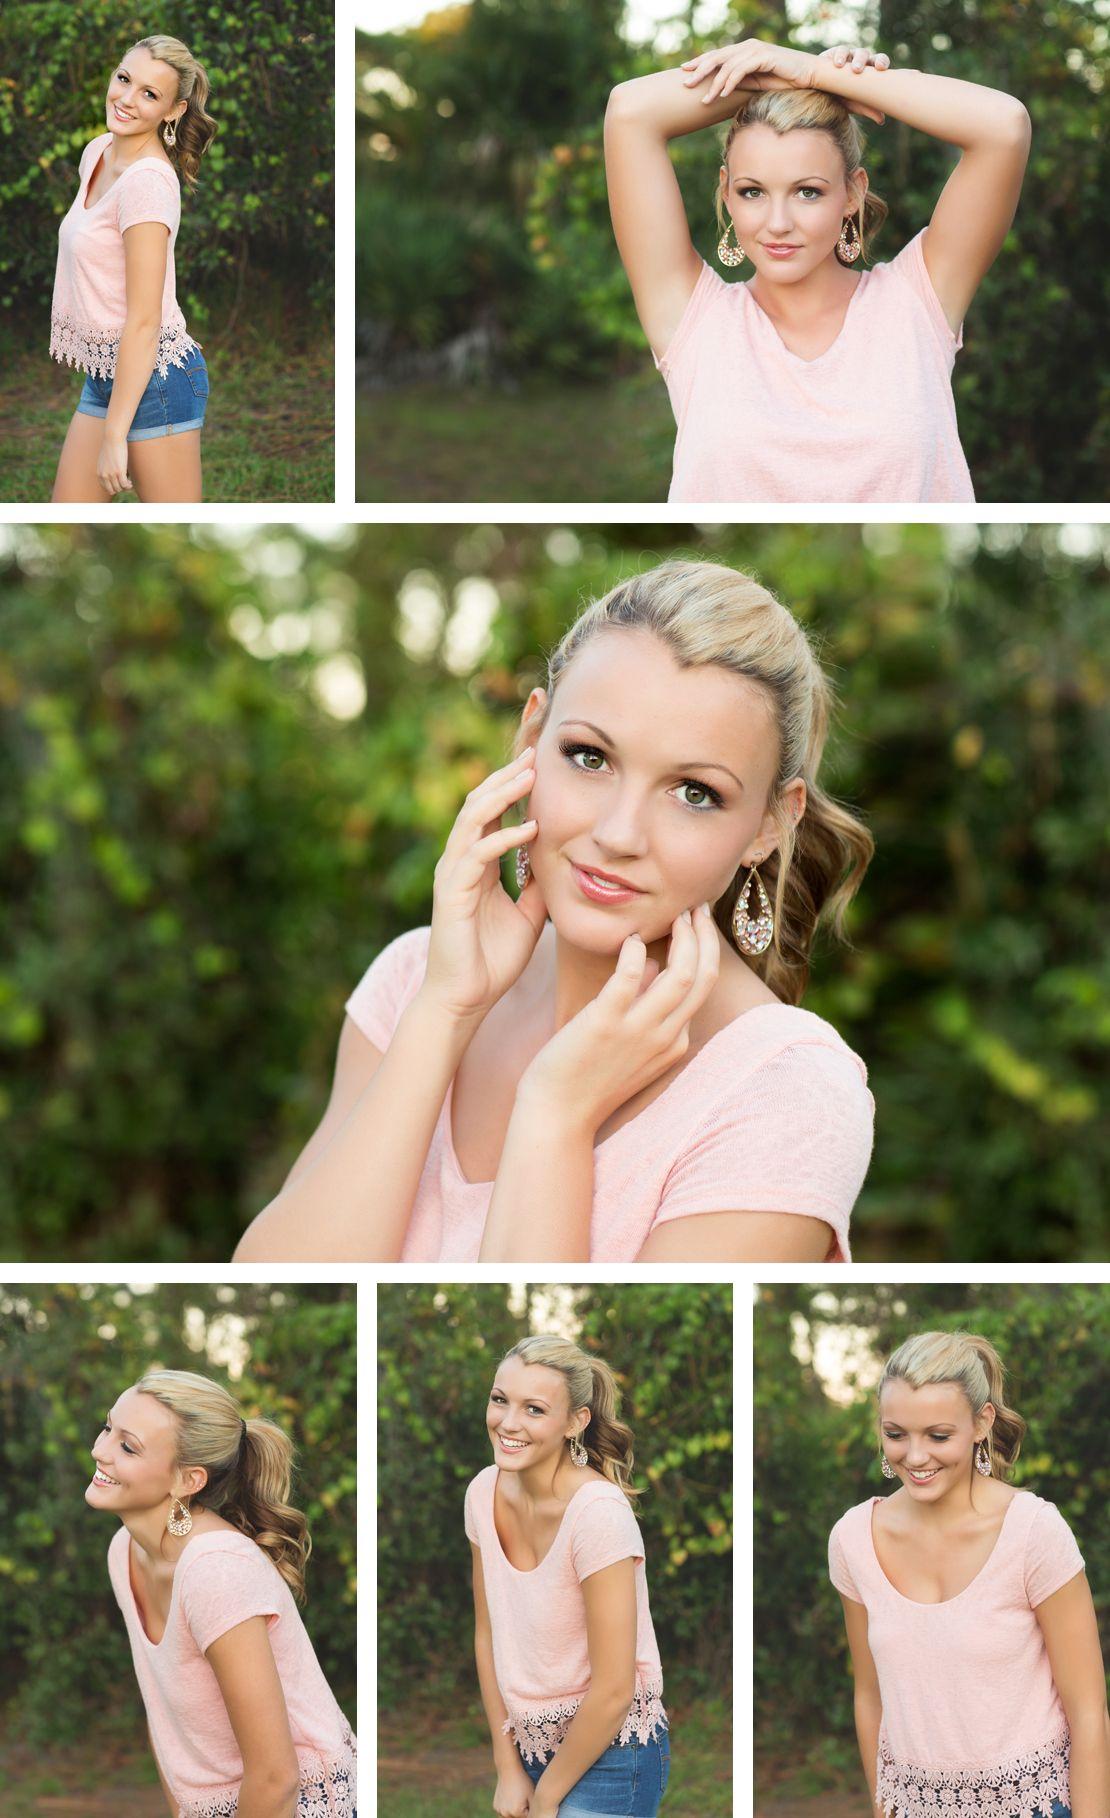 Alexandra Feild Photography Senior Portraits Viera Melbourne Orlando Florida | Senior girl posing, pretty in pink, soft lighting